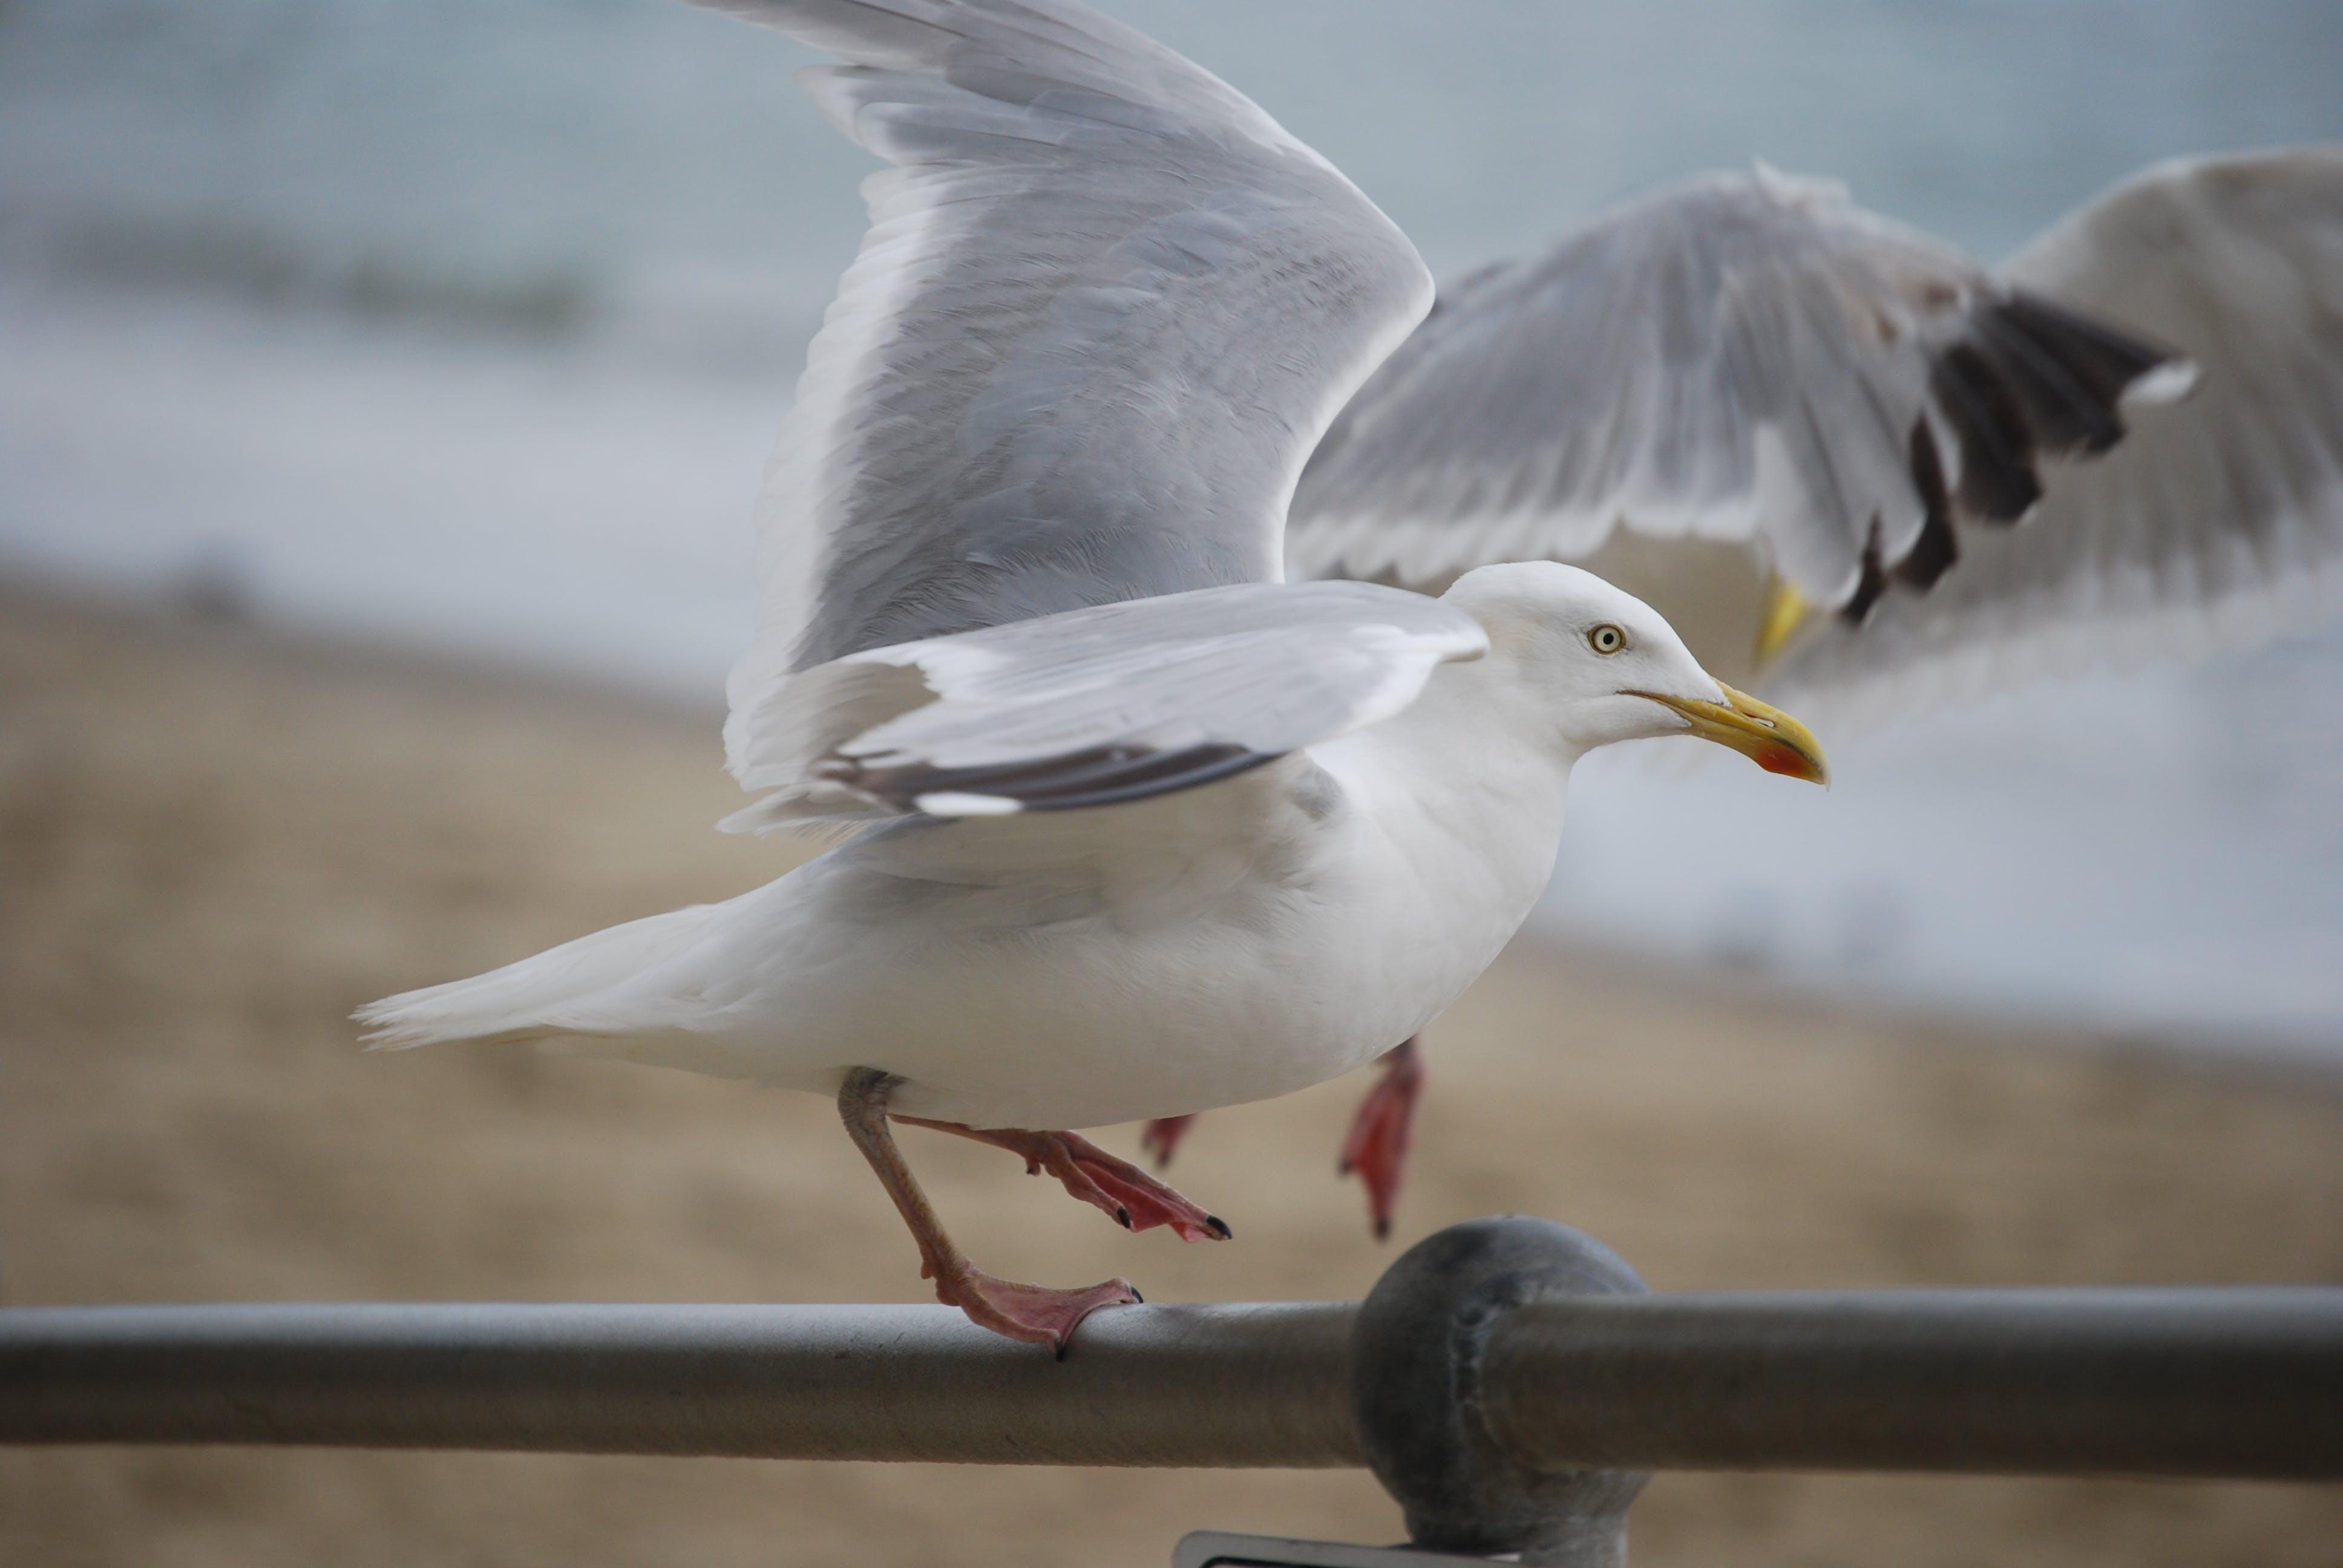 White Bird on Silver Steel Rod